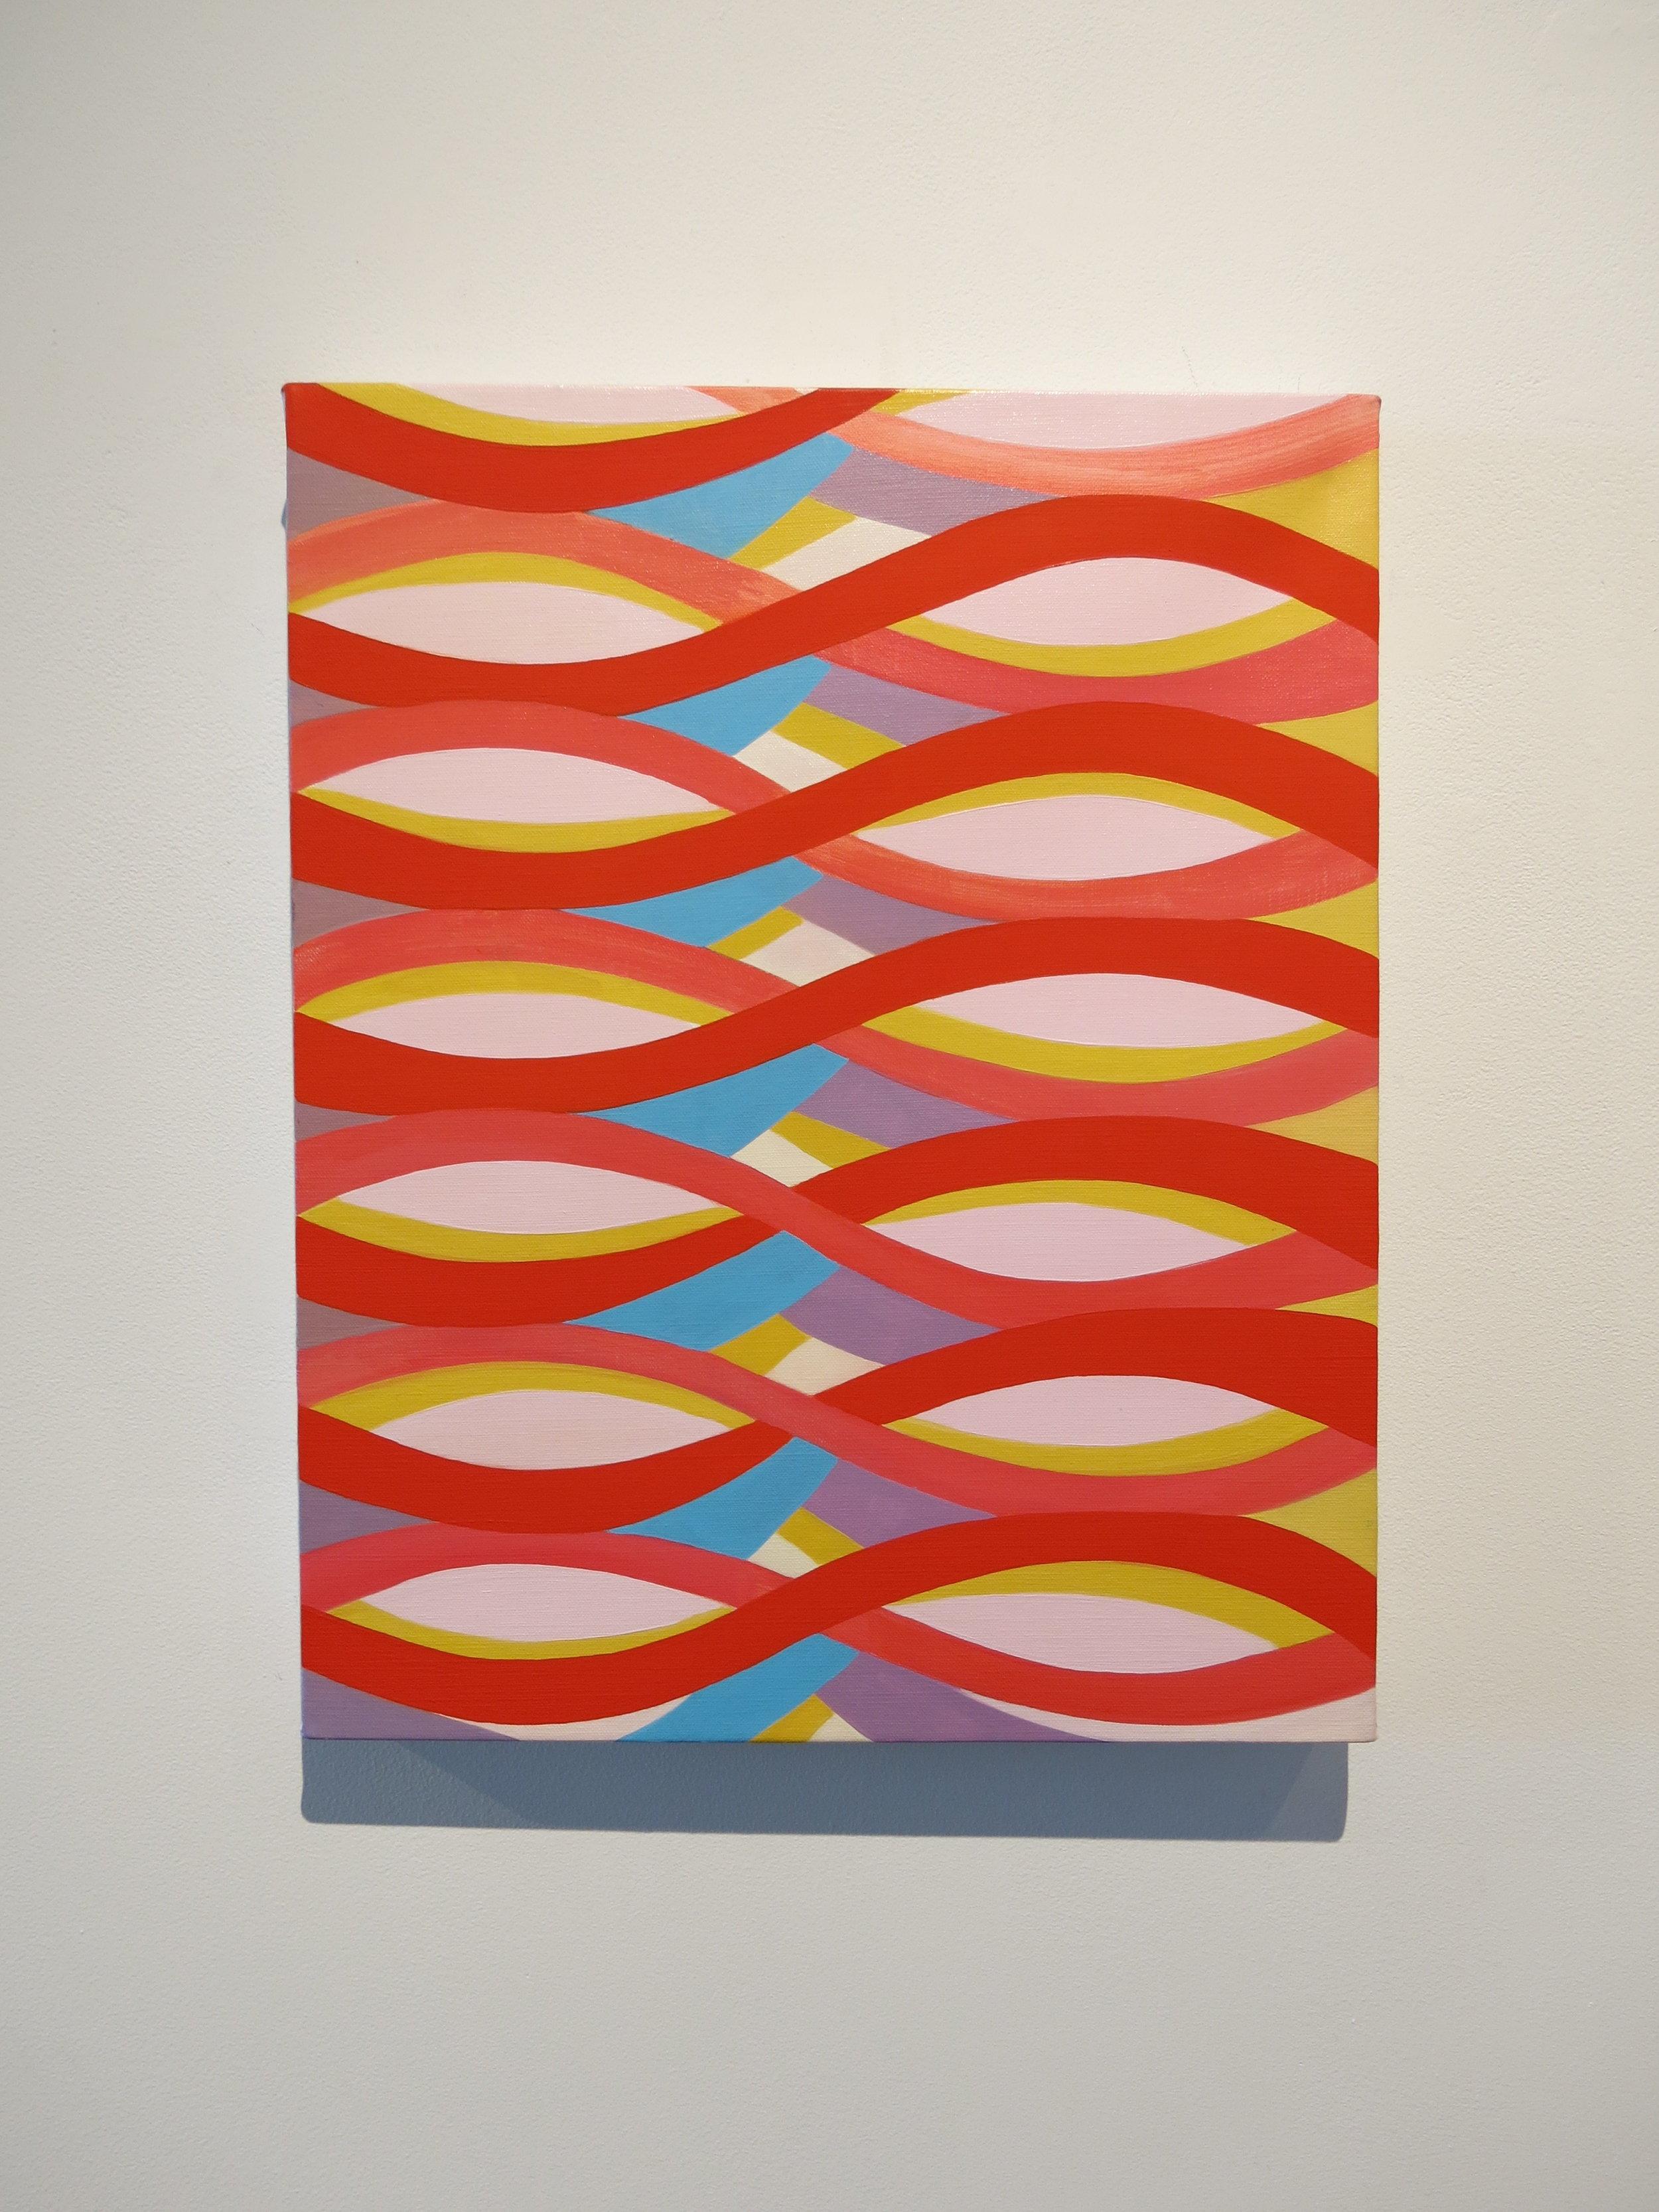 Jenifer Kobylarz, Tangle , 2013, oil on linen, 20h x 16w in.